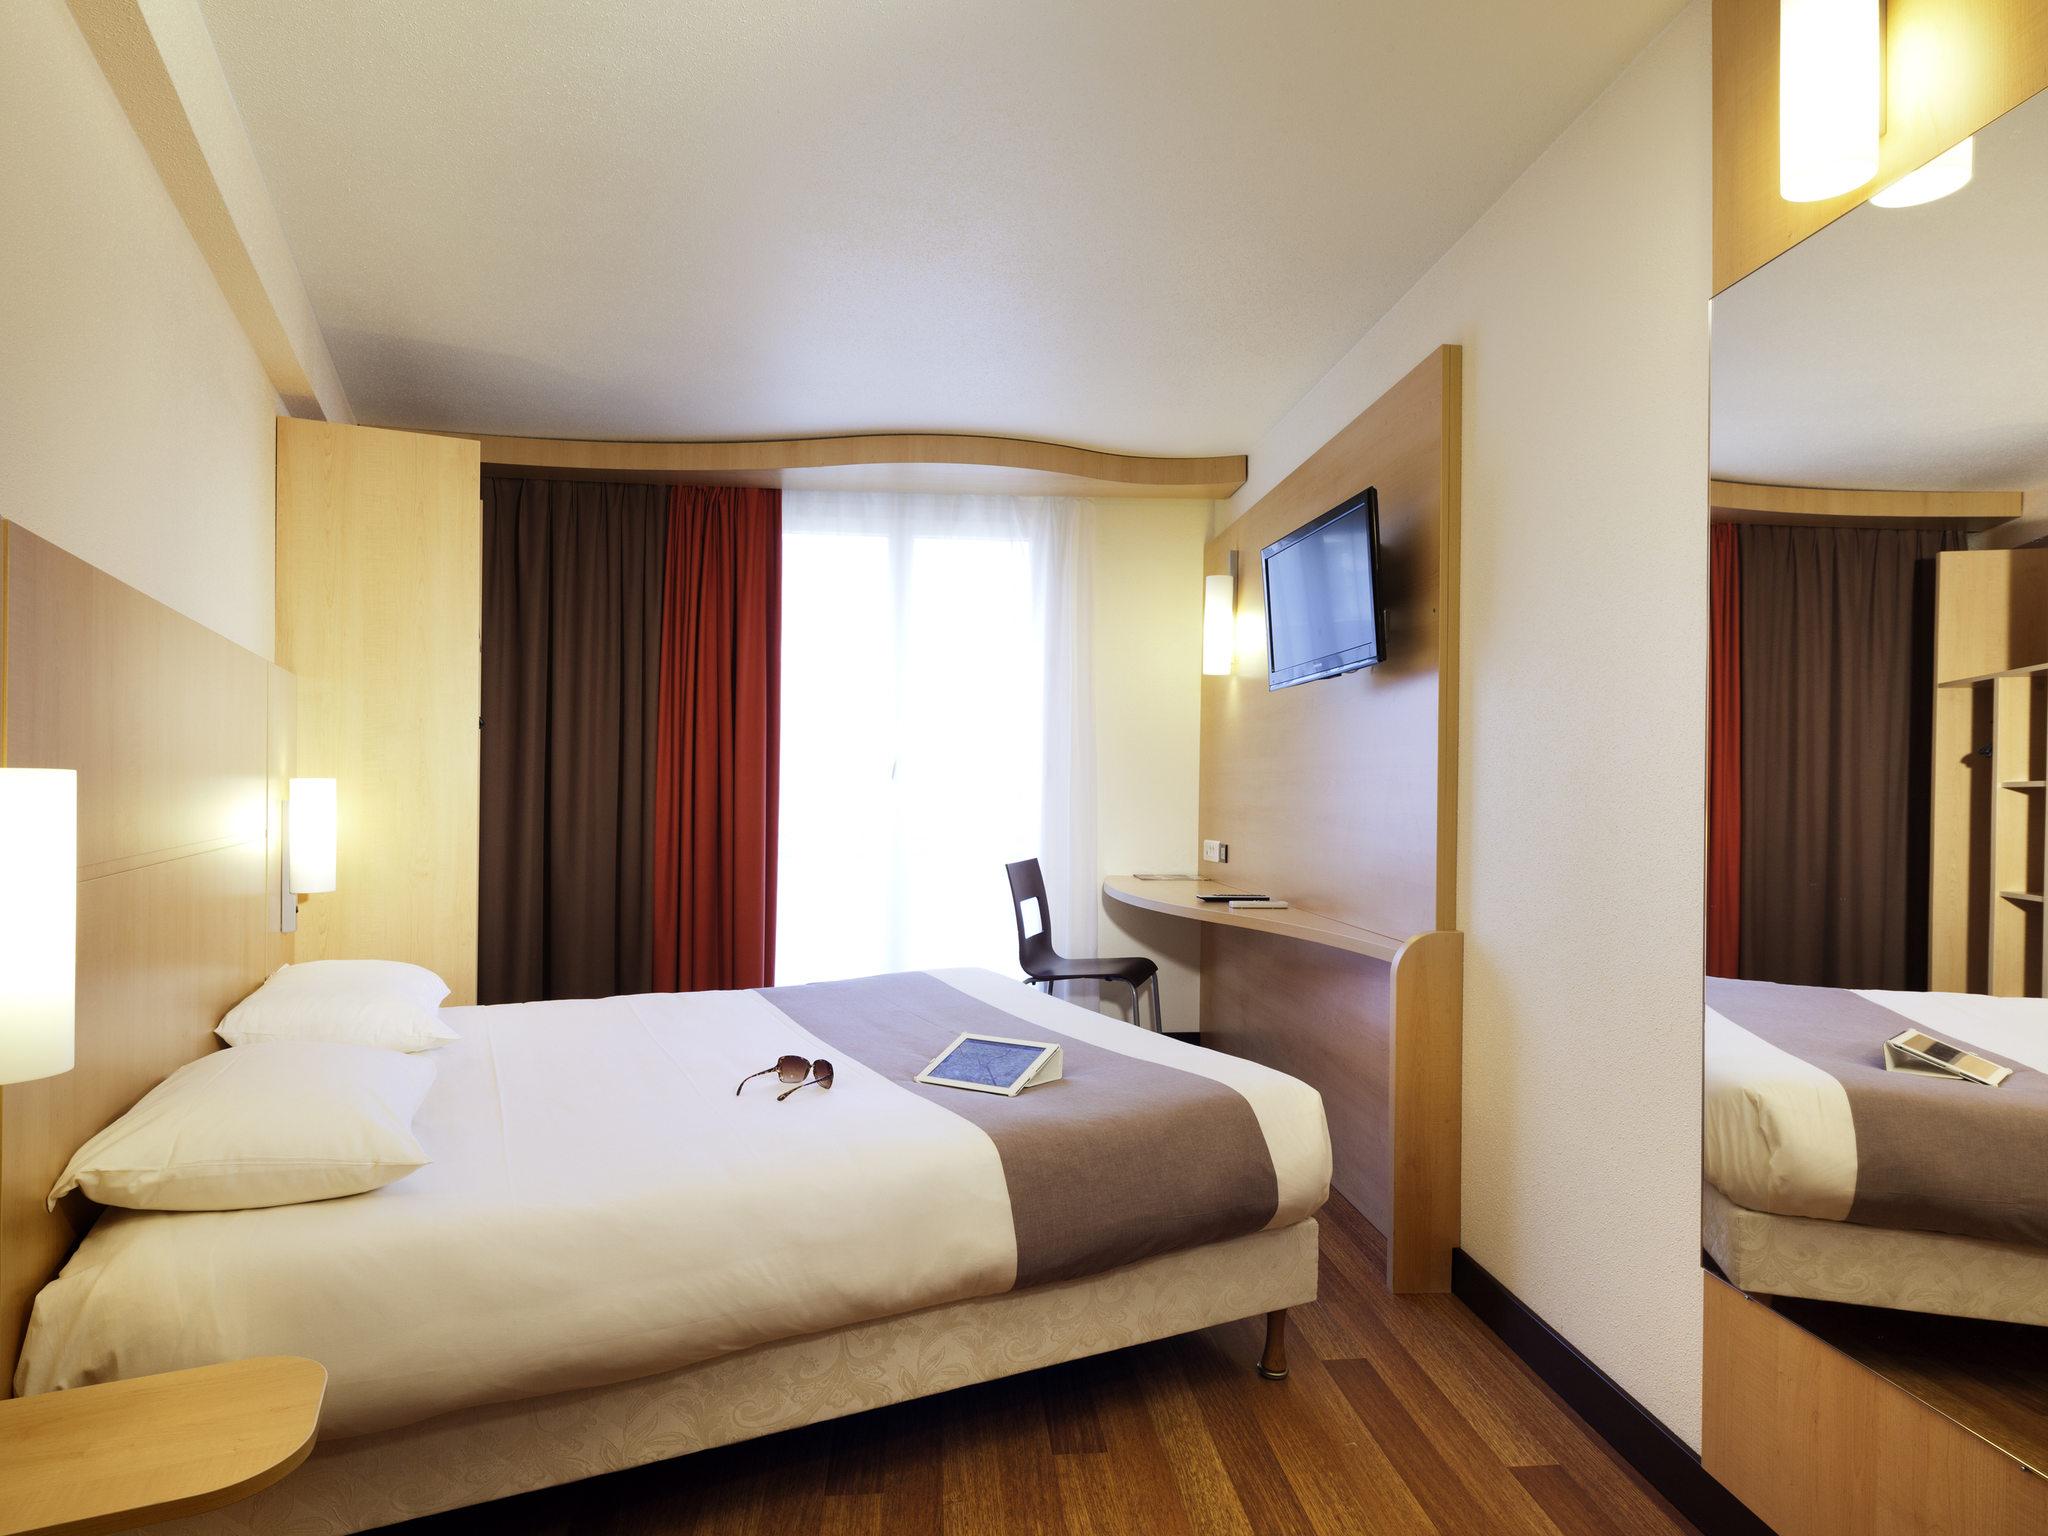 فندق - إيبيس ibis باريس غار دو ليون رويي